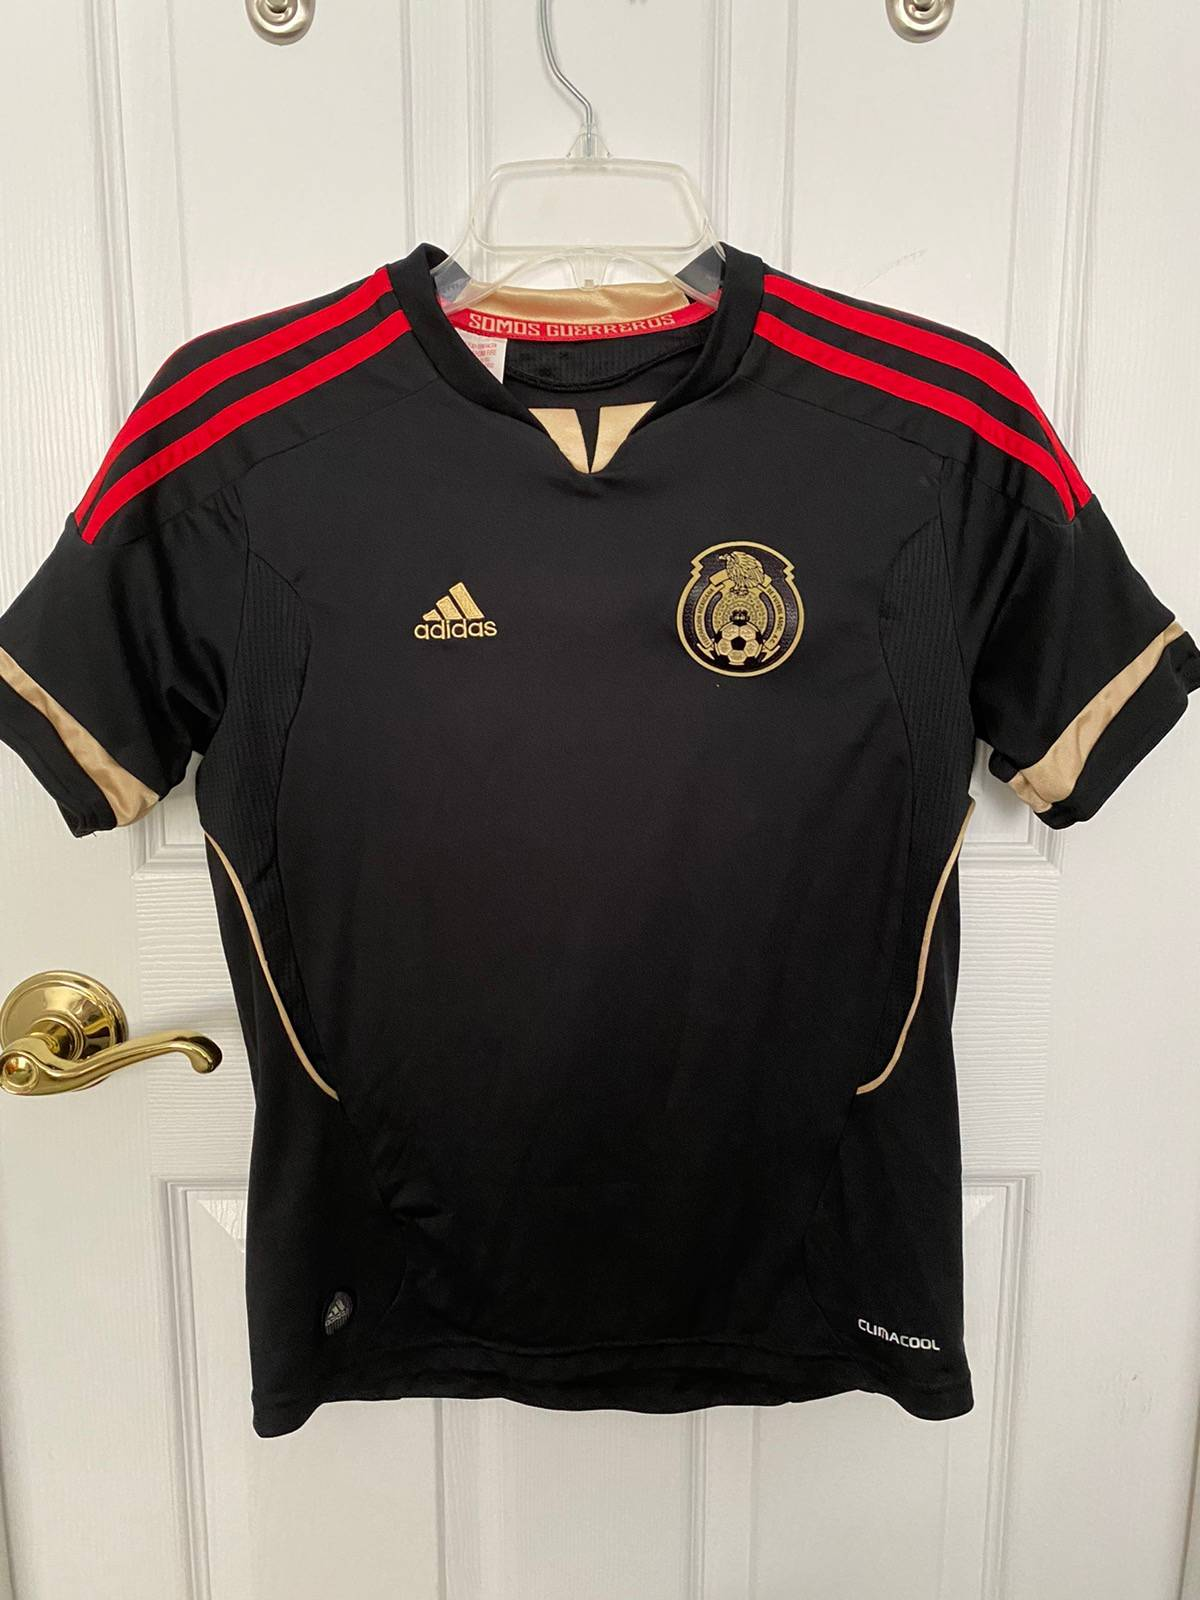 Adidas Mexico 11/12 Away Soccer Jersey